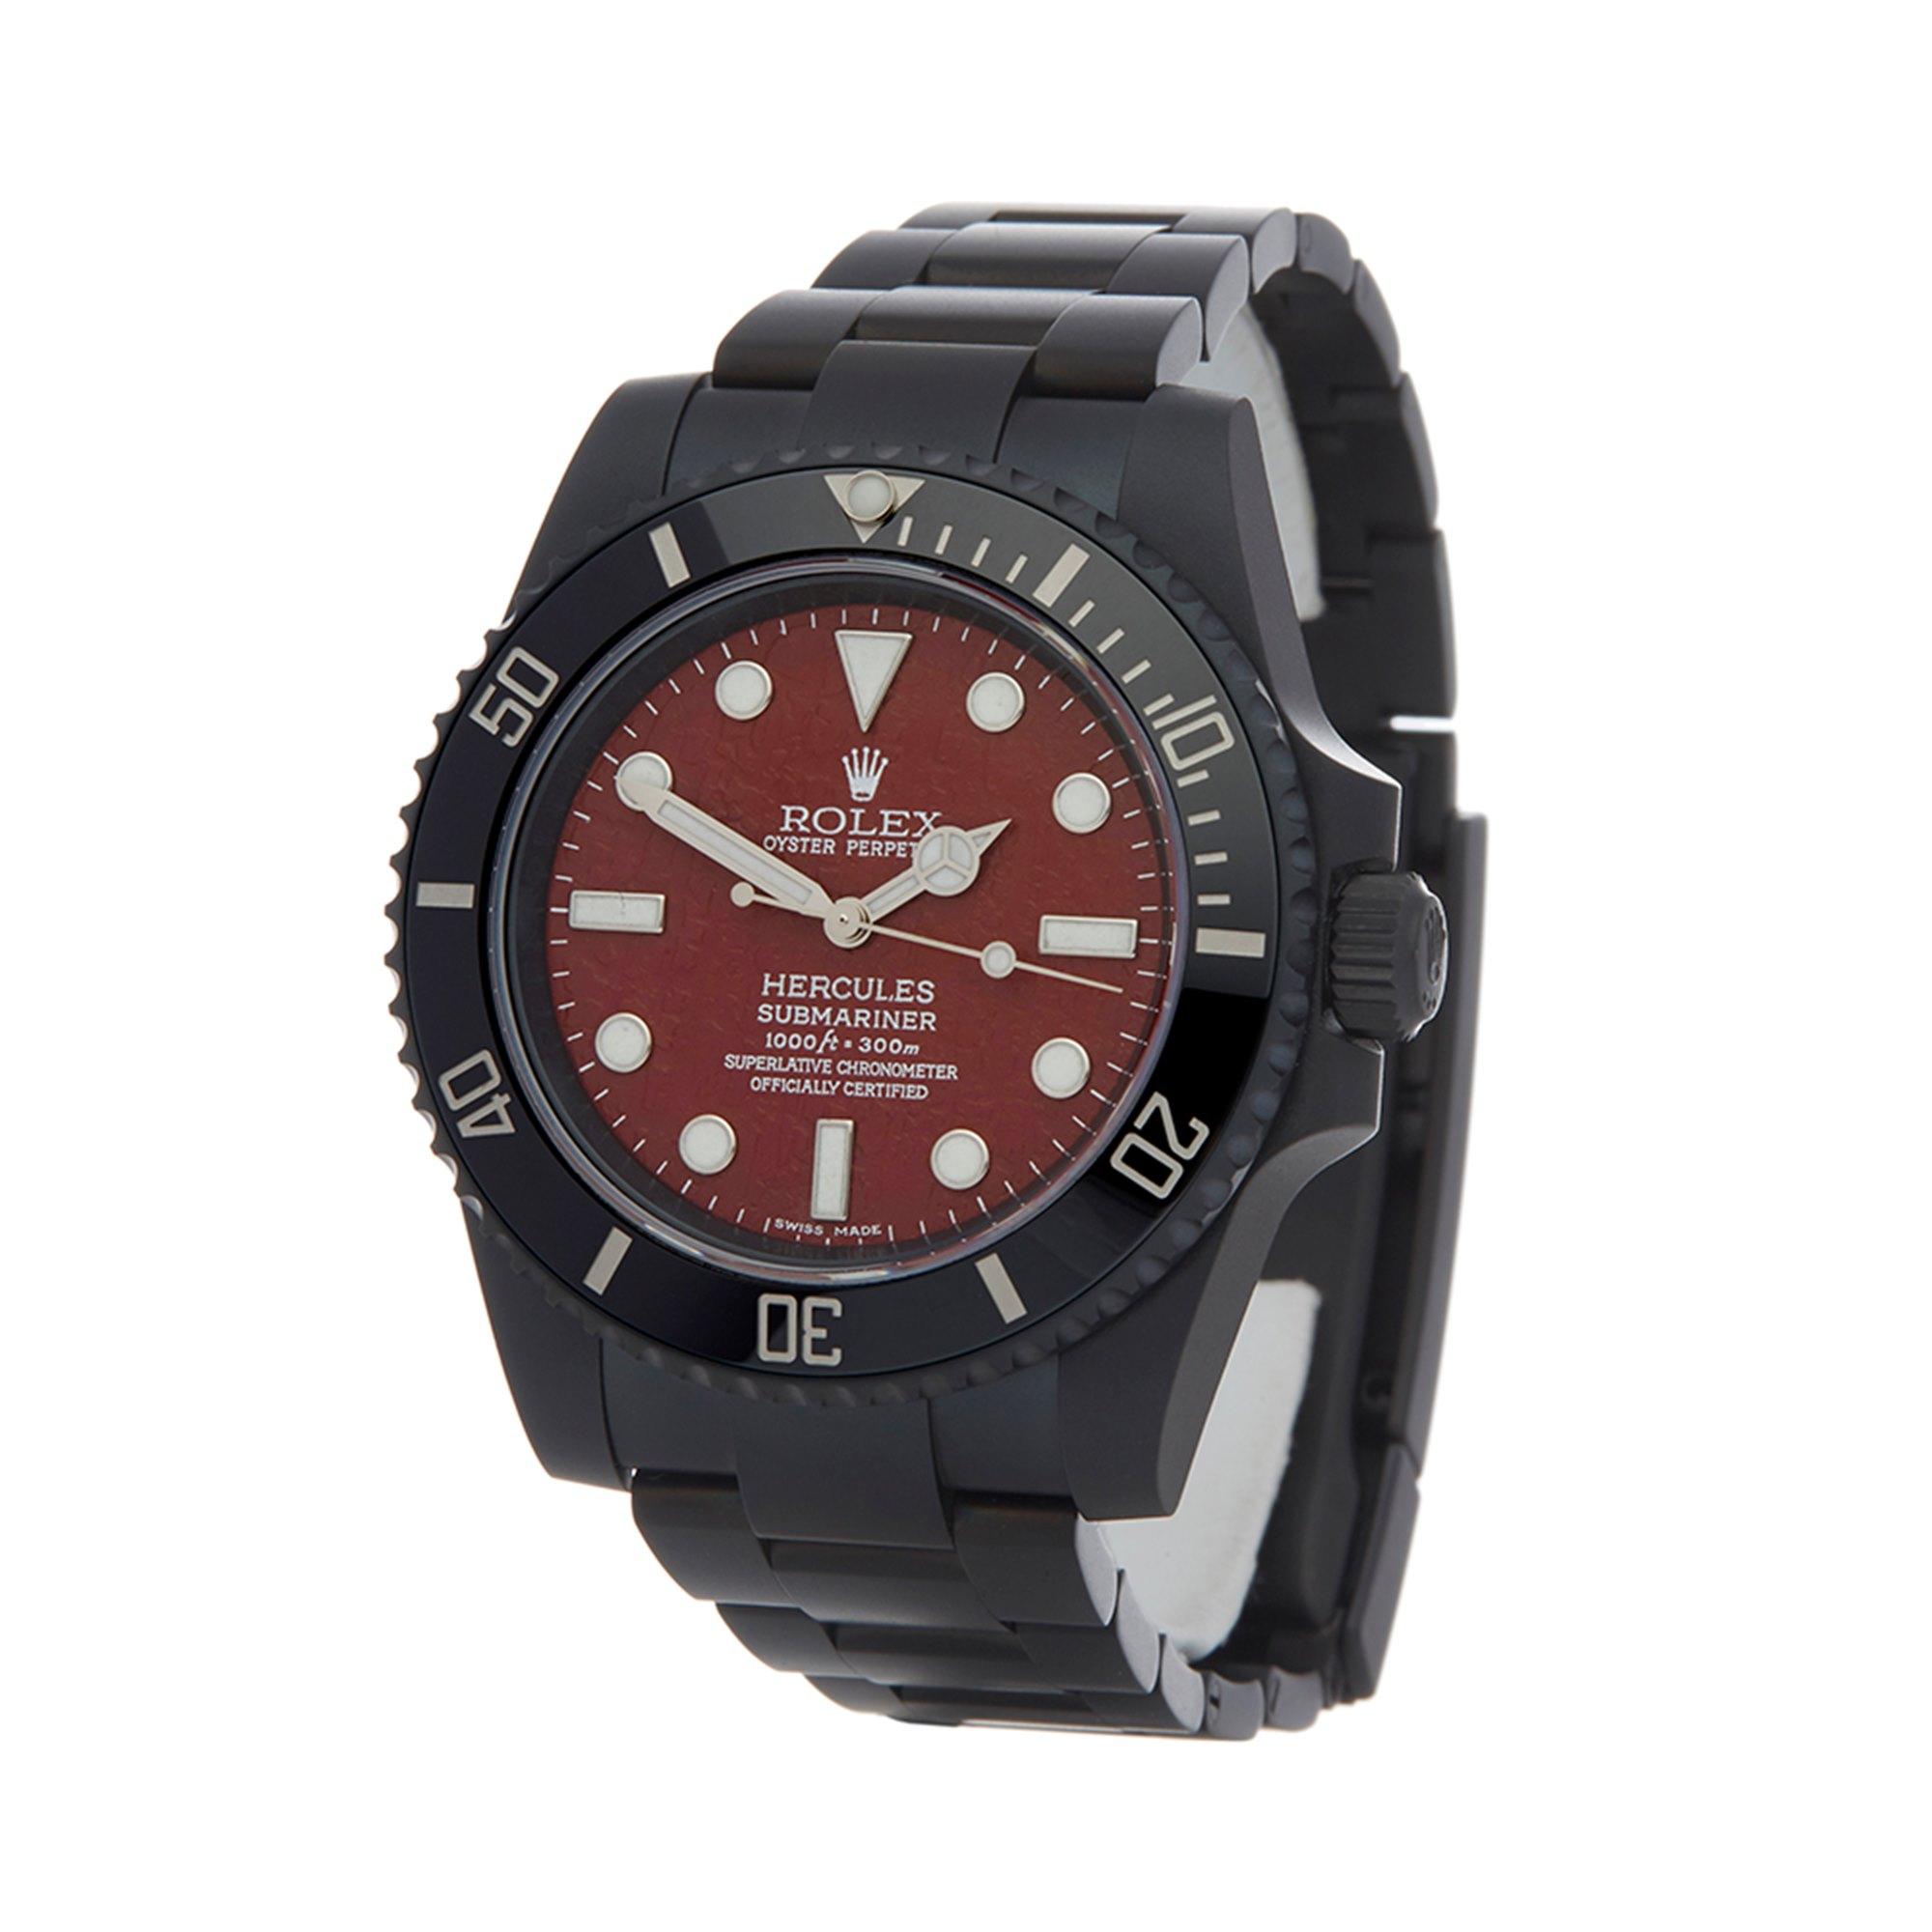 Rolex Submariner No Date Hercules Custom Dlc Coated Stainless Steel 114060